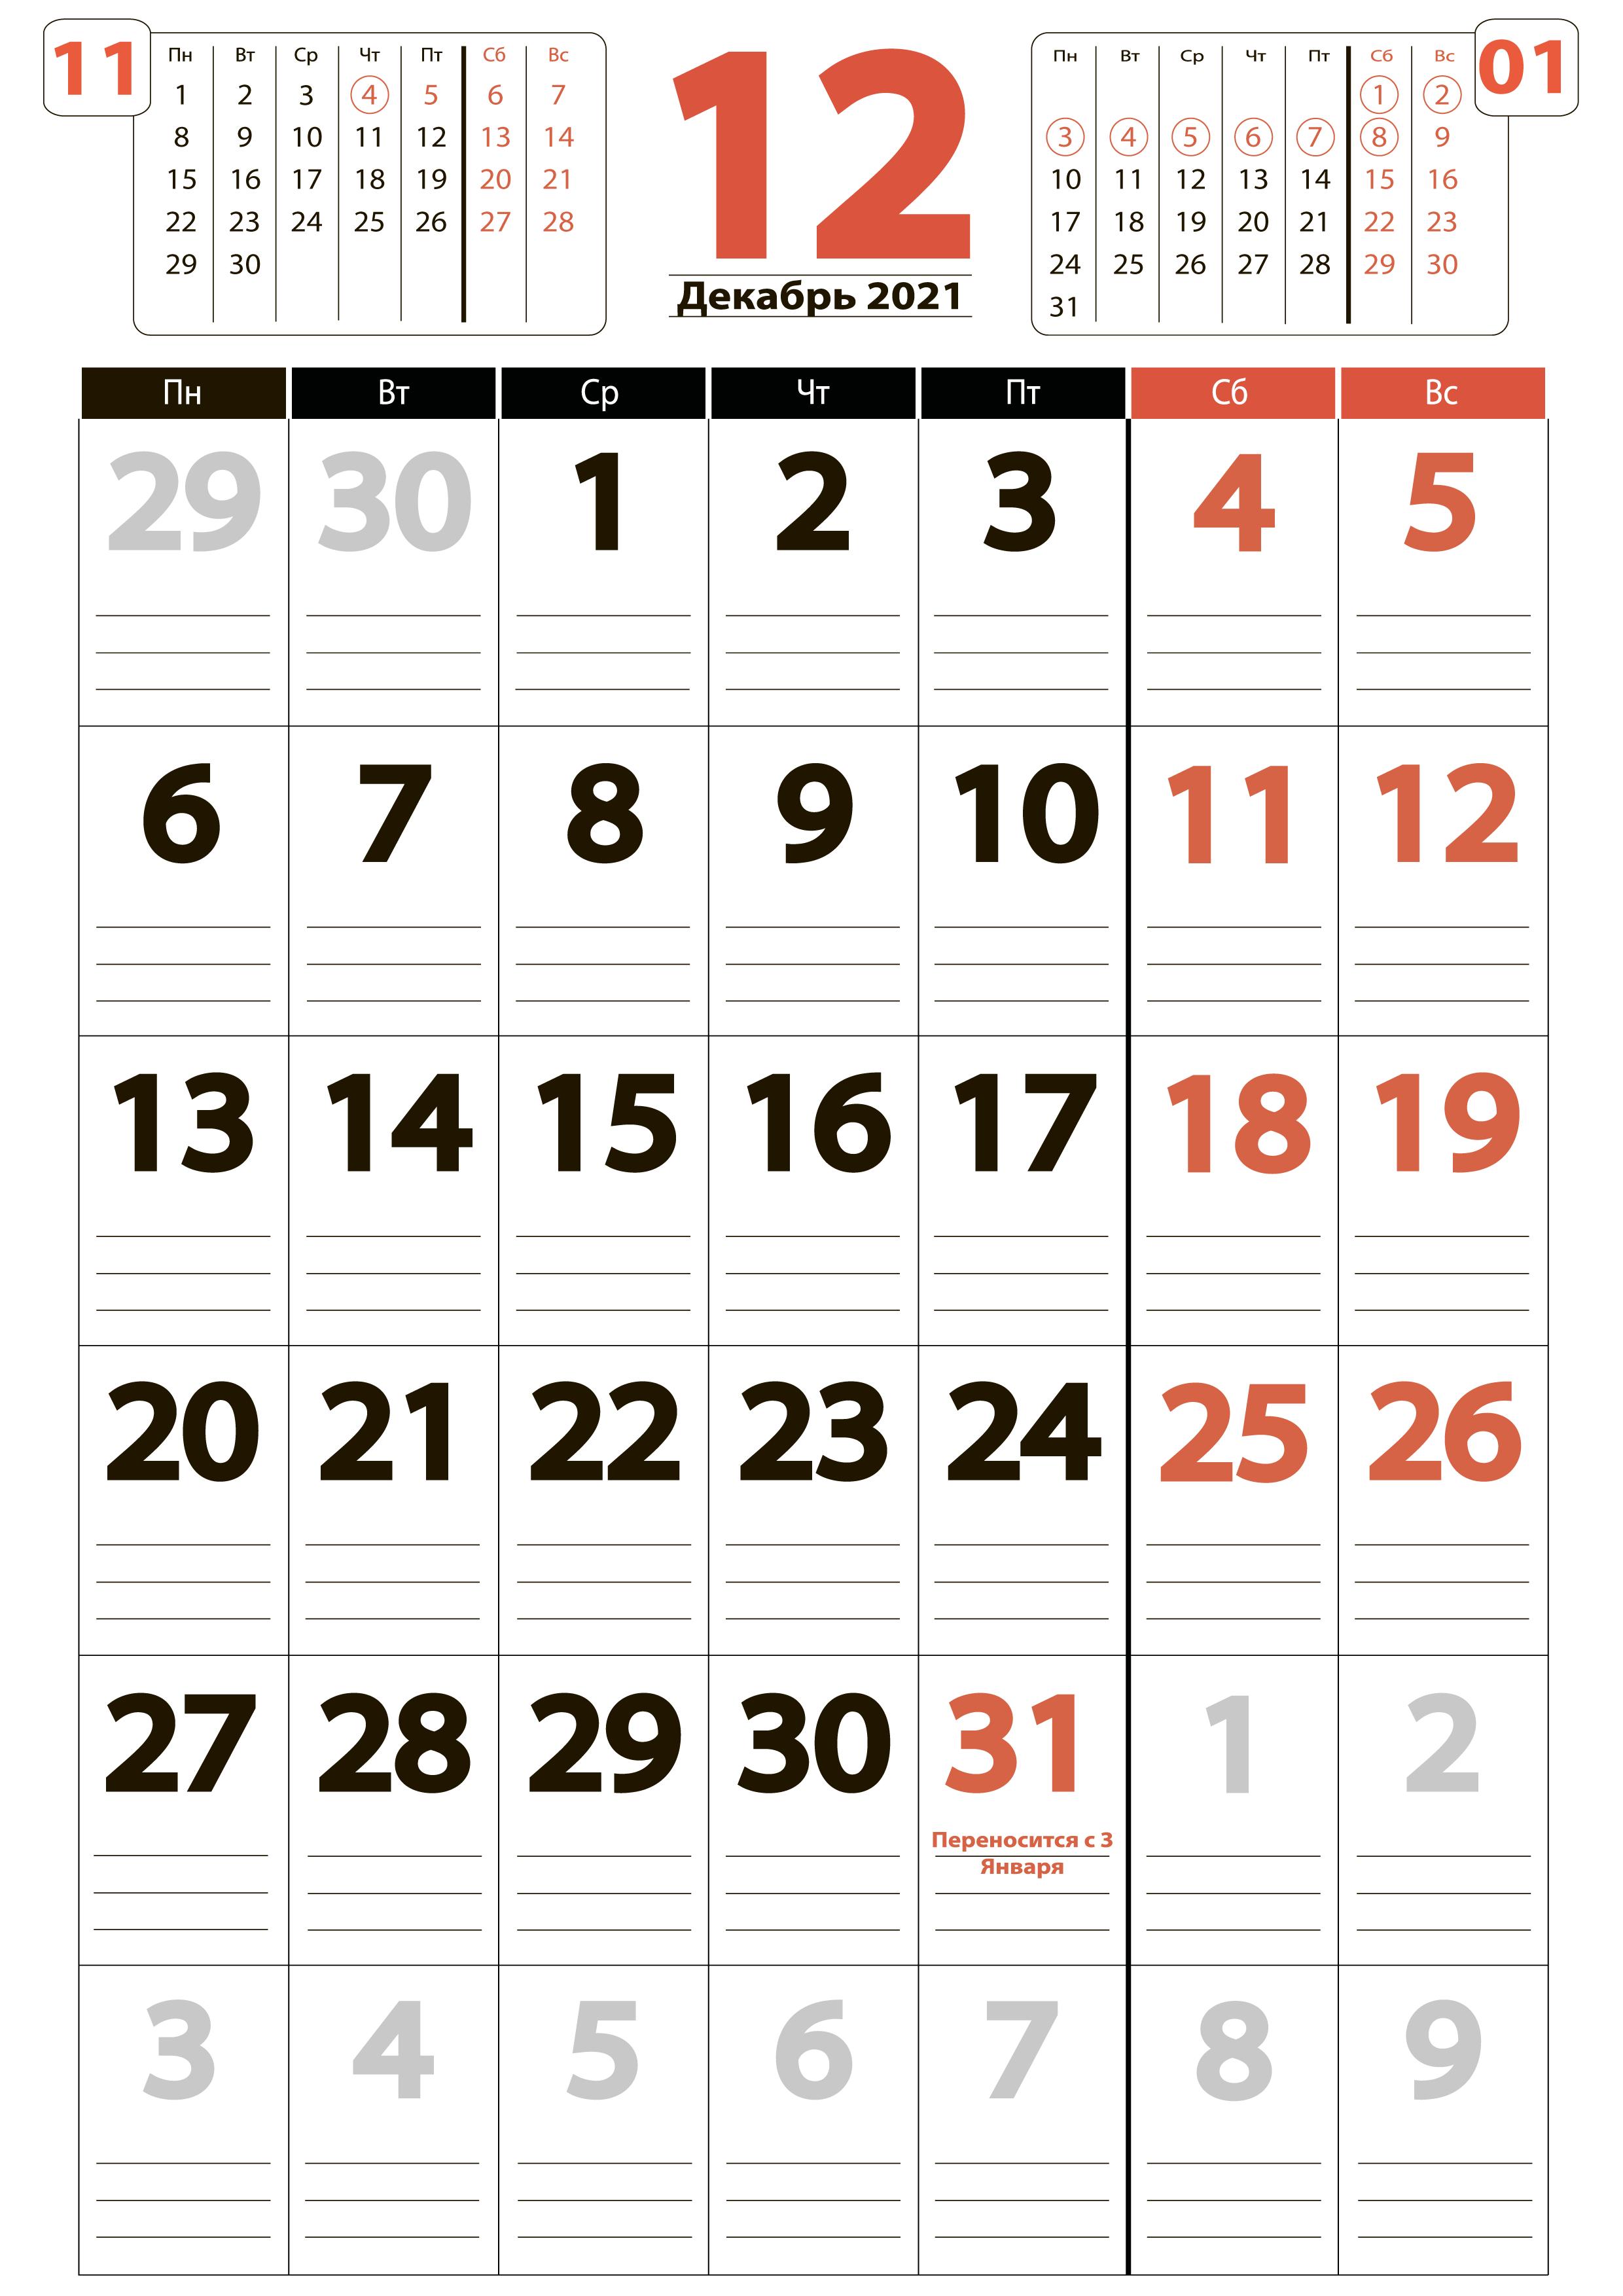 Декабрь 2021 - Календарь книжный формат